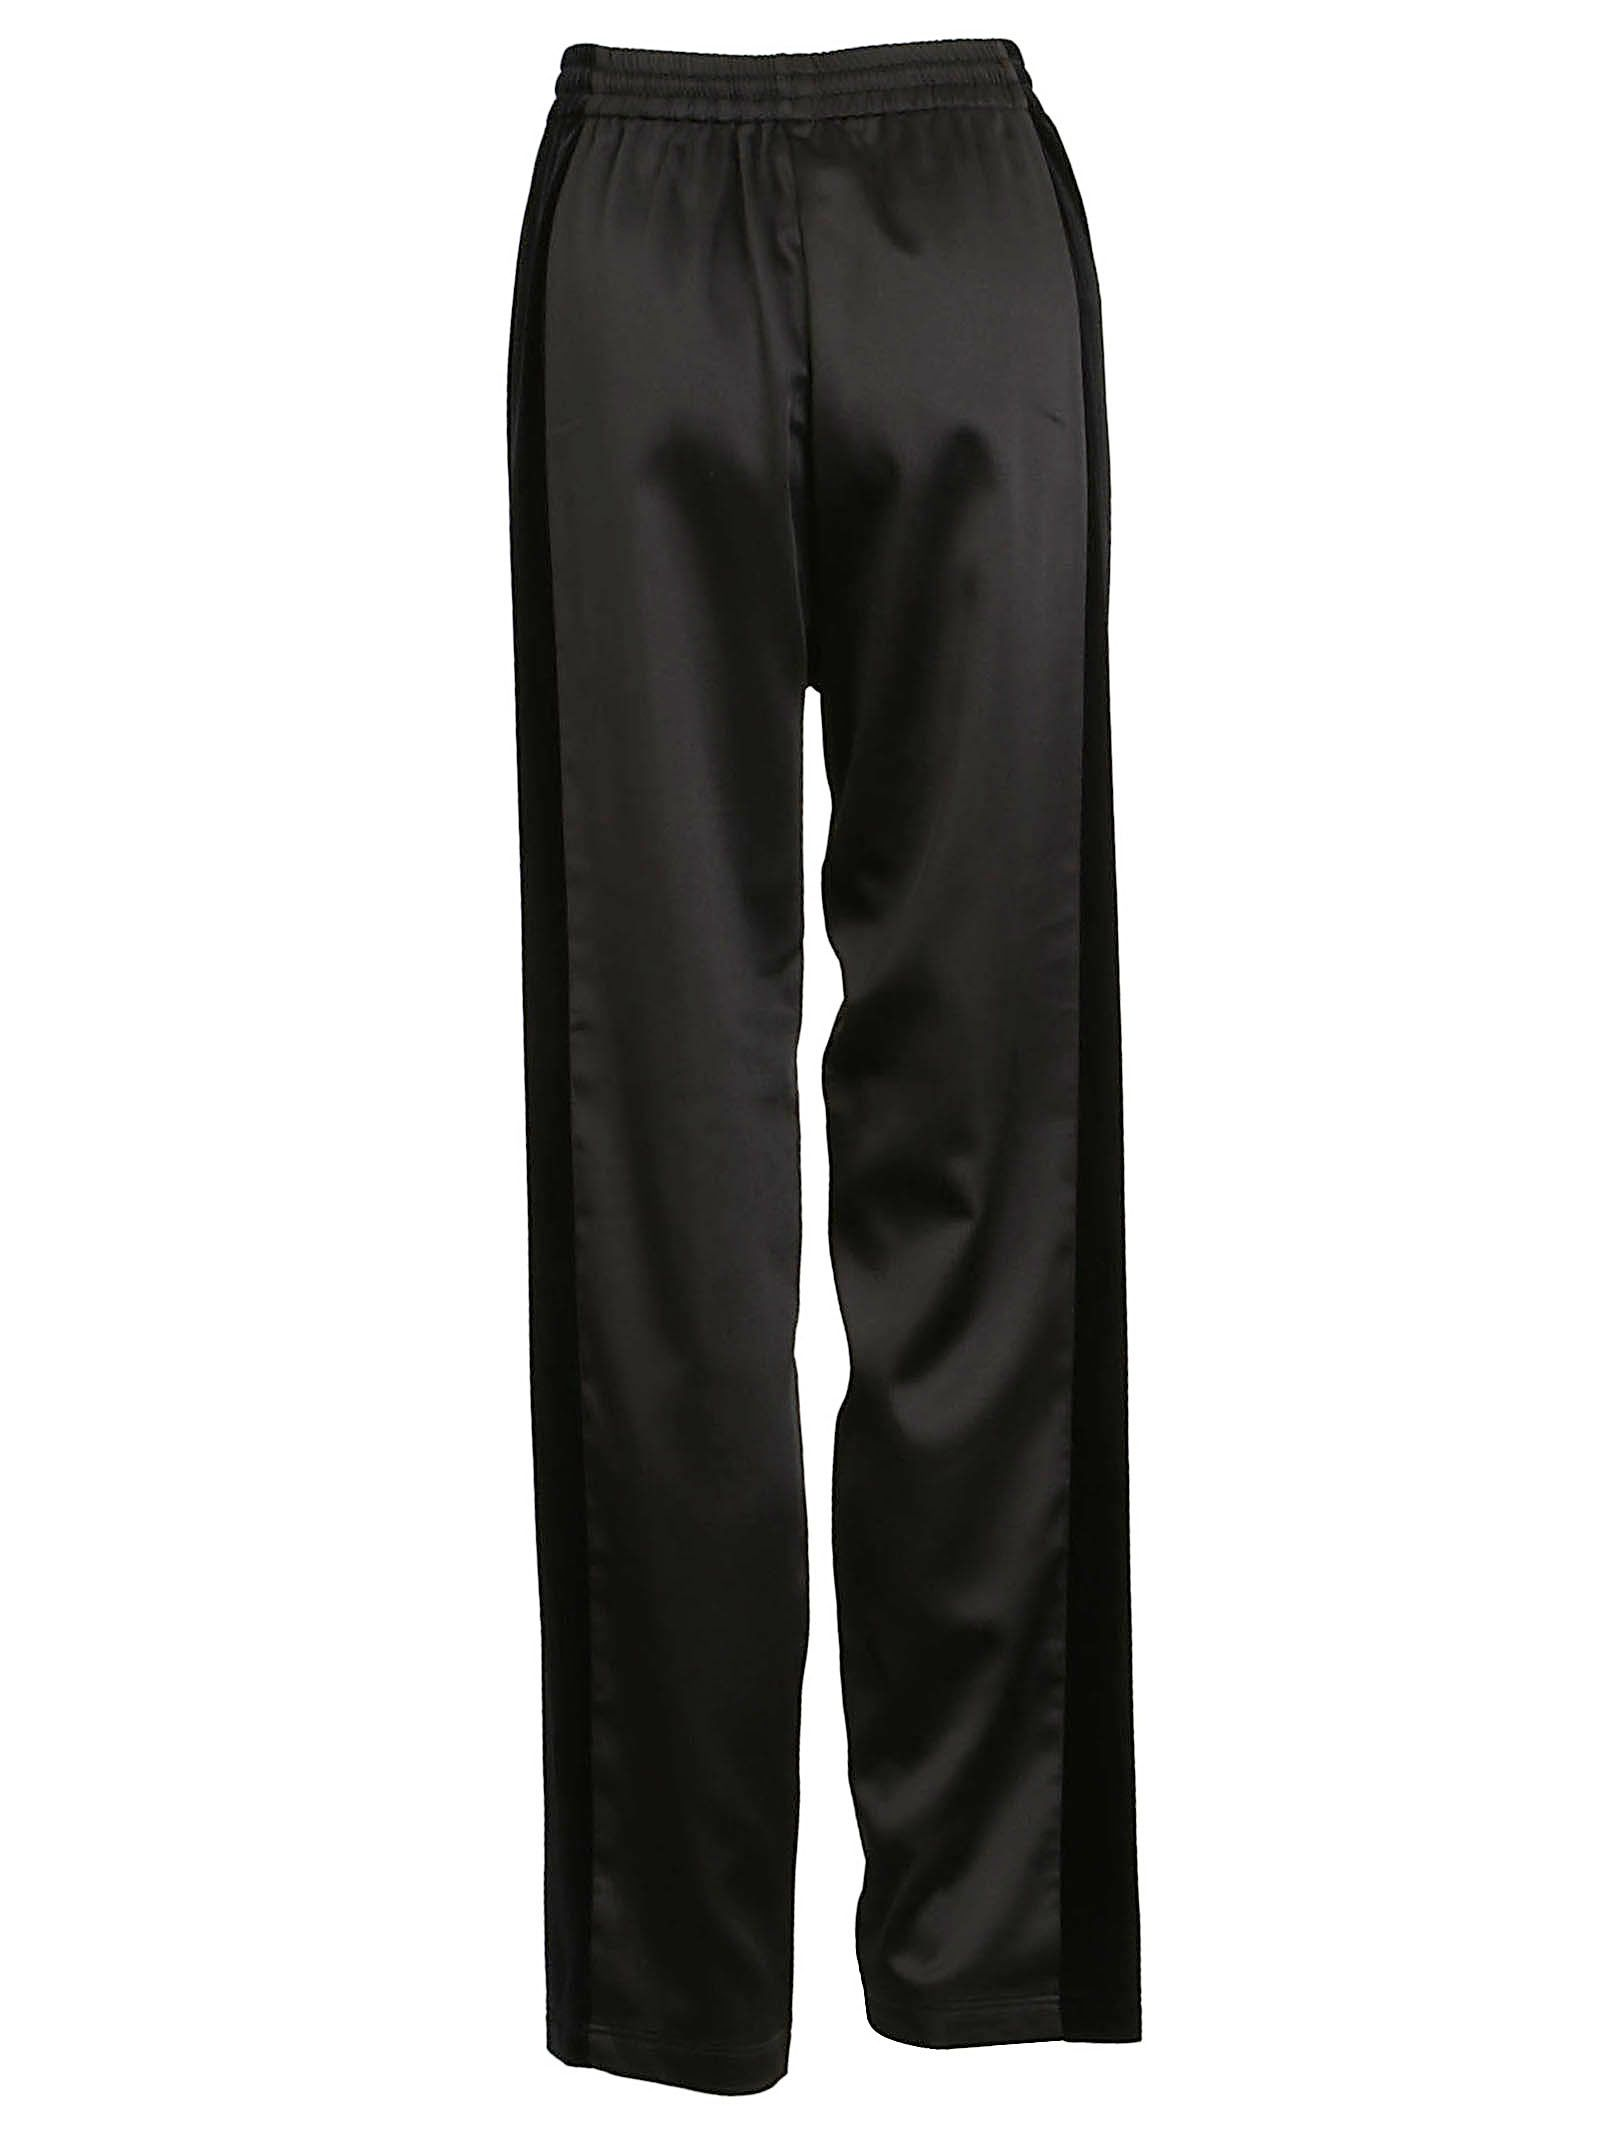 Visa Payment For Sale Outlet Release Dates high-waist track trousers - Black Koché Online Shop RuxbkL3CoG